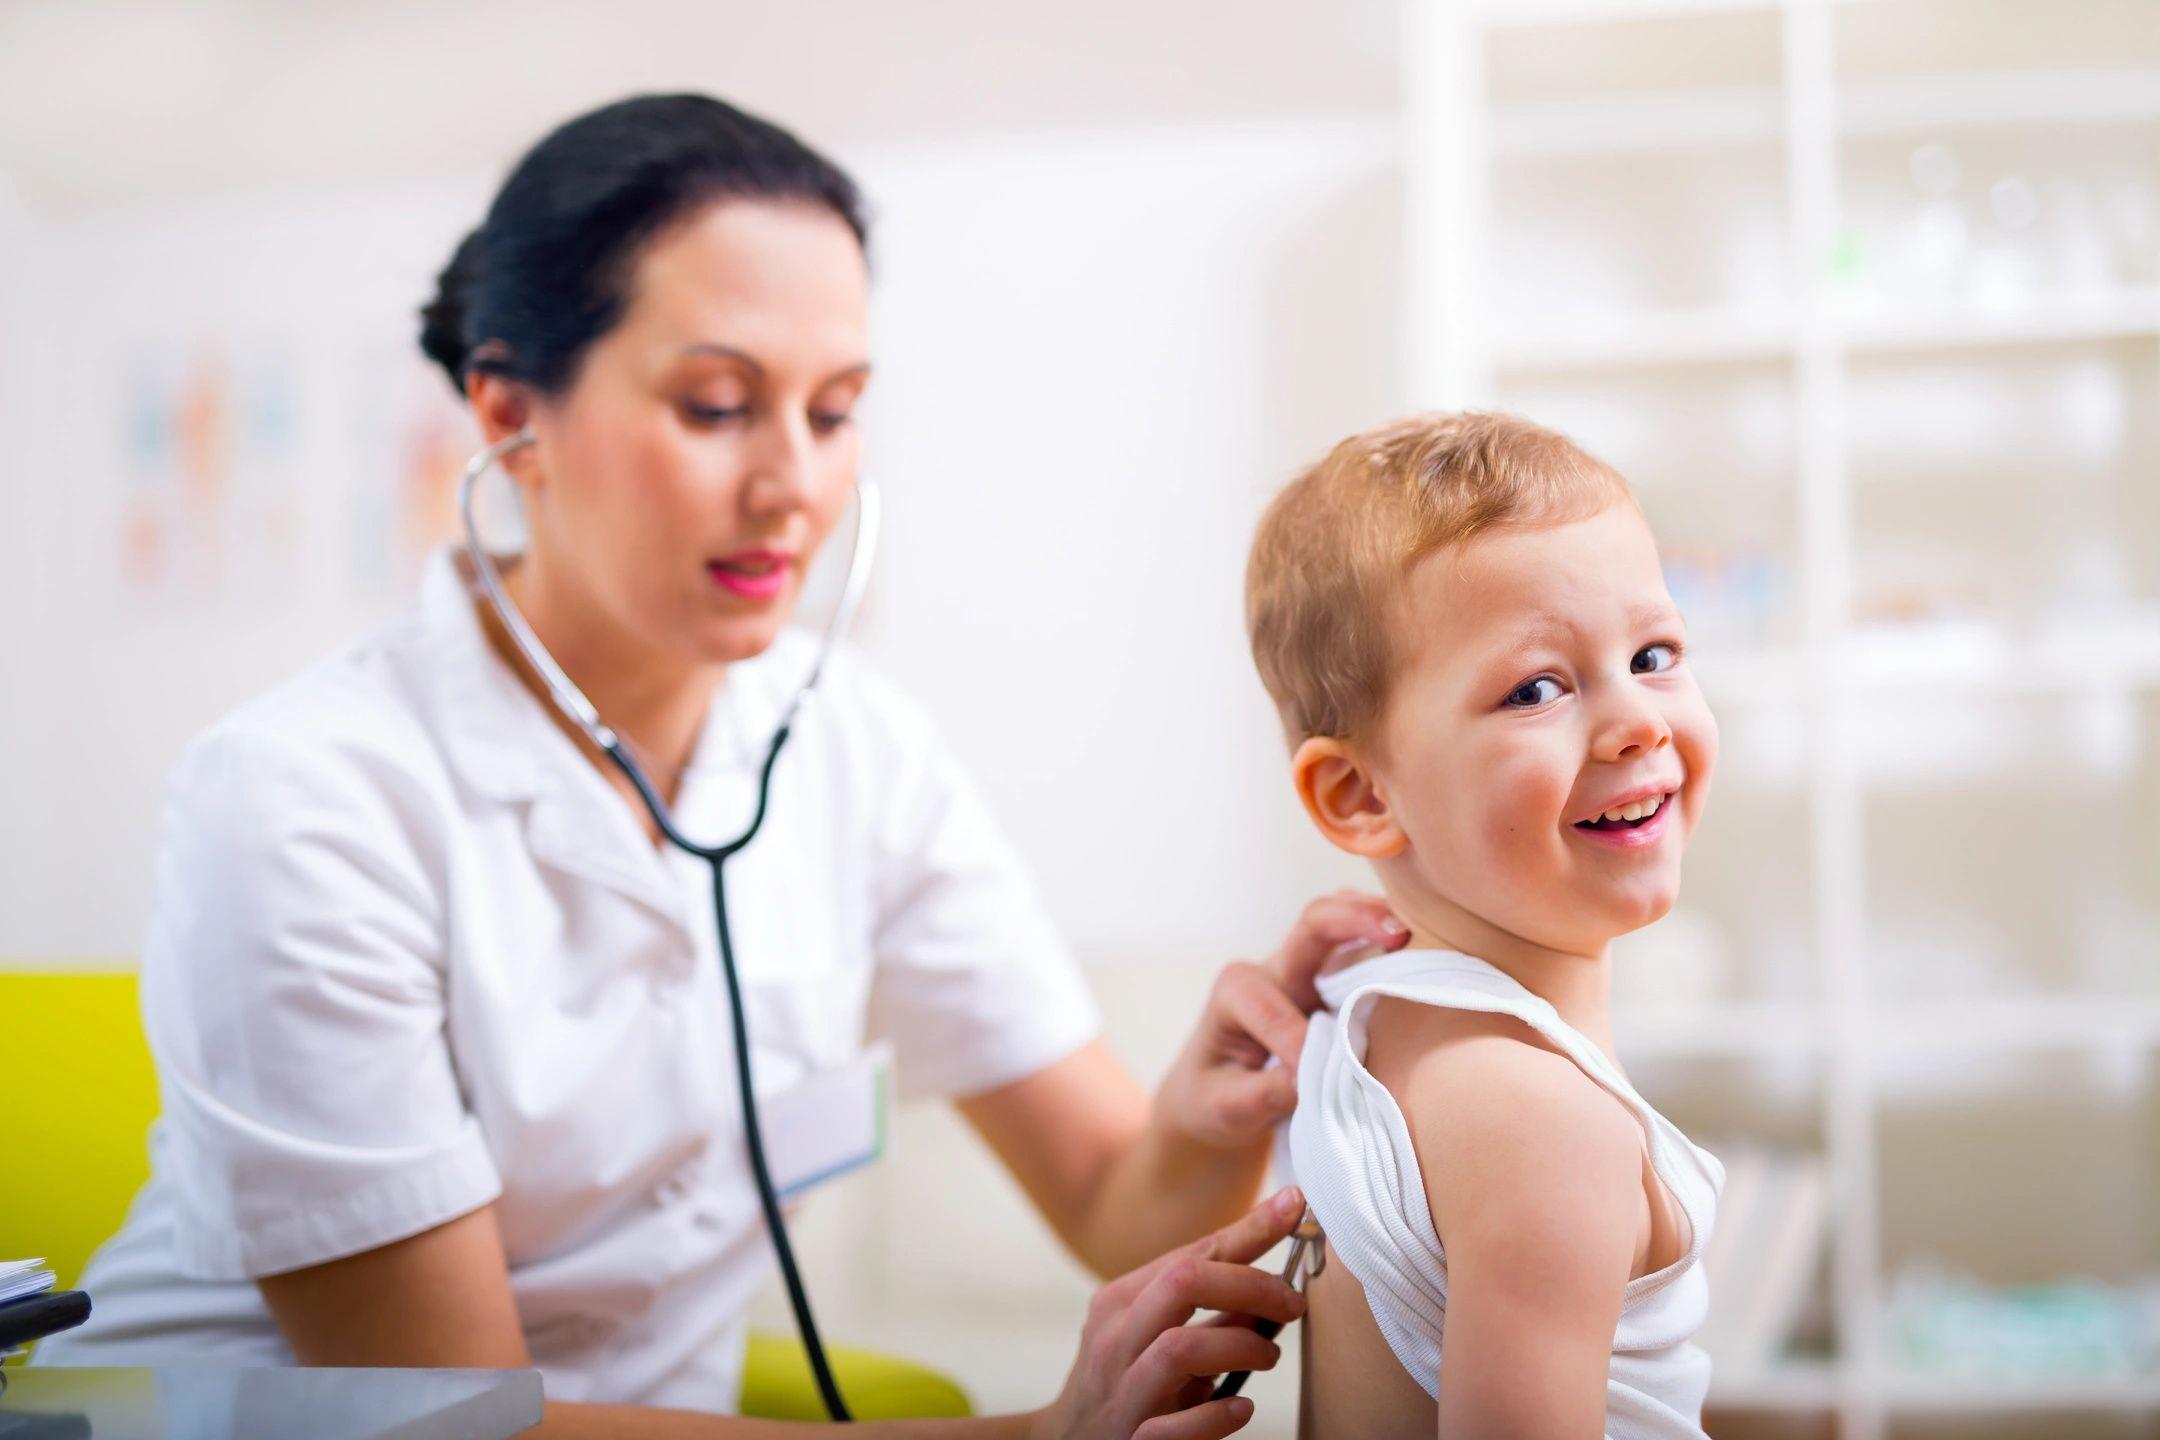 A nurse using a stethoscope on a child